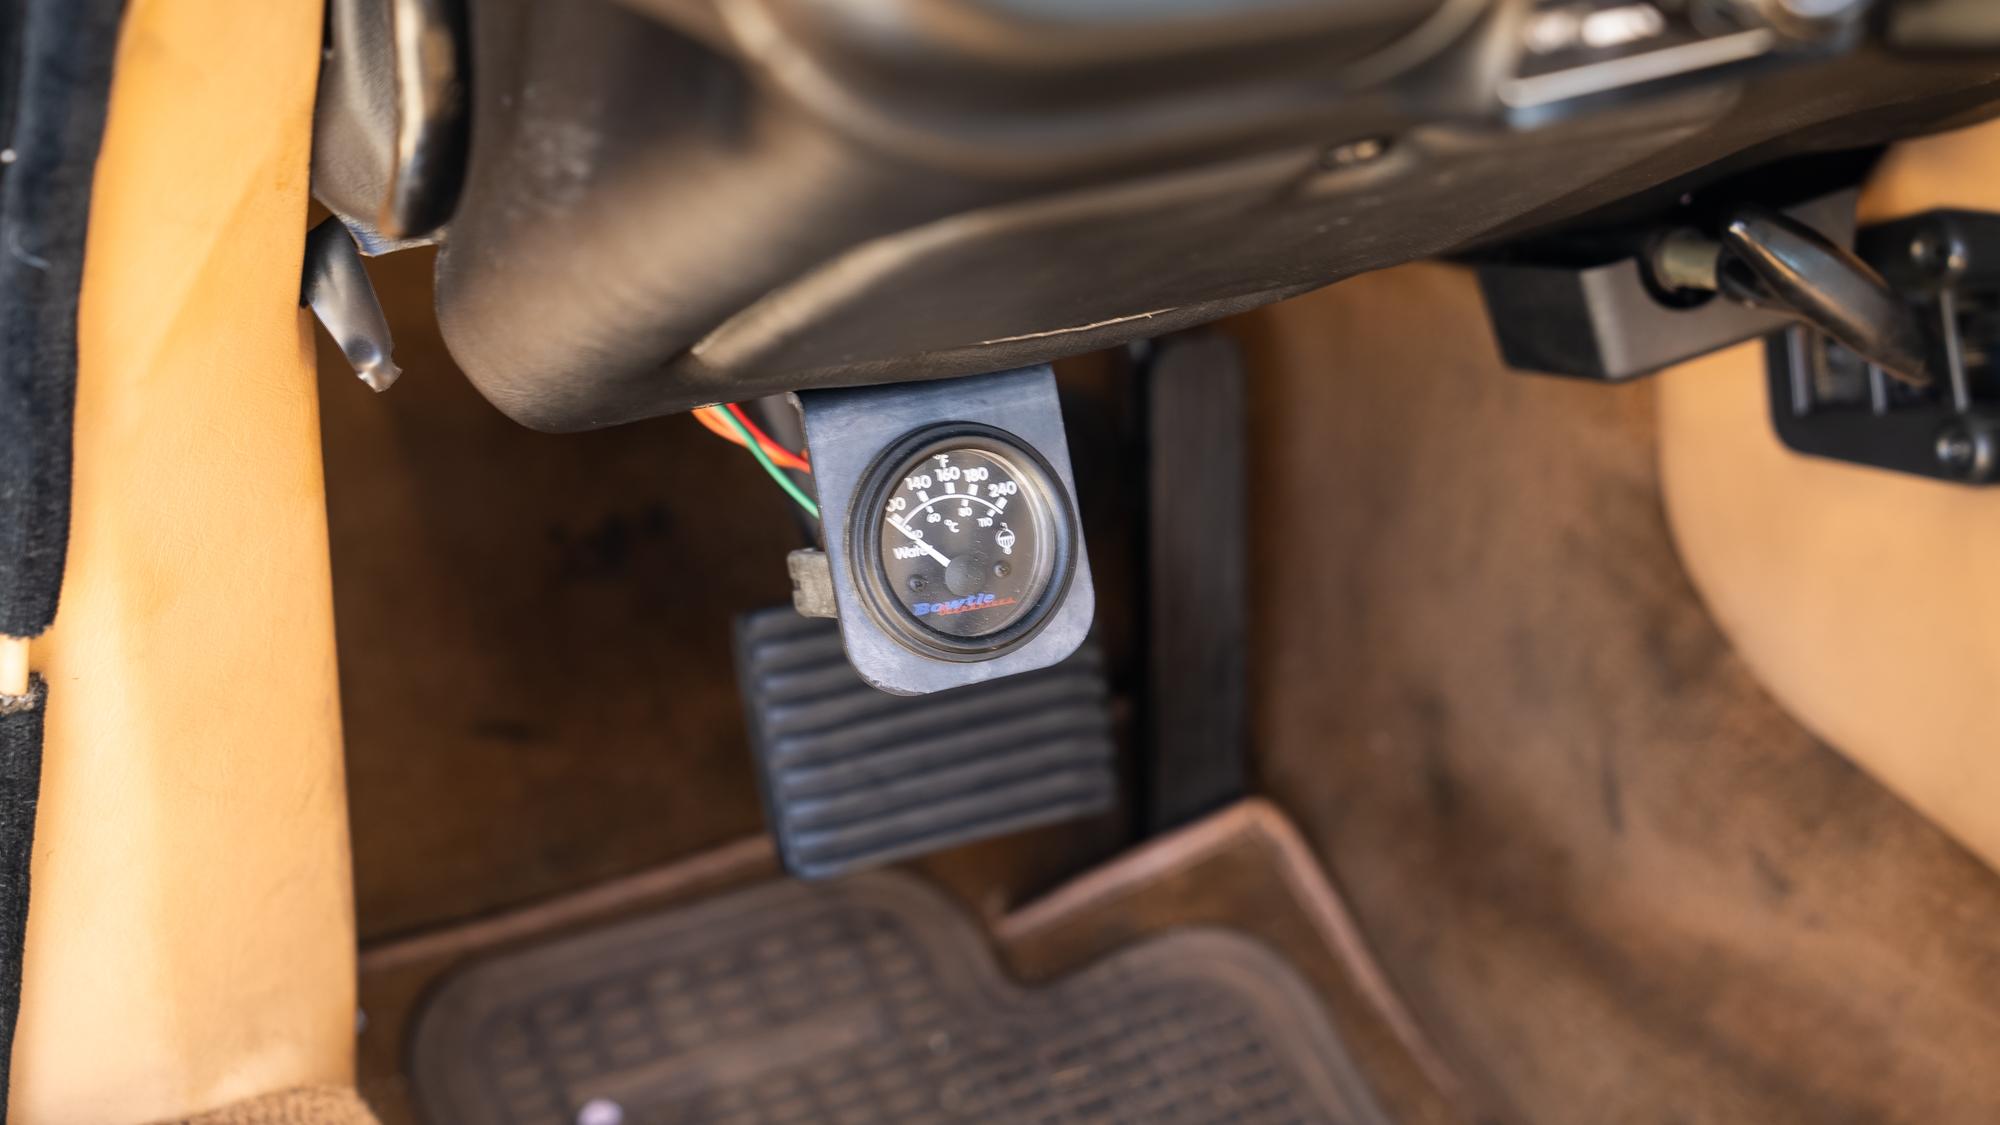 1986 Jaguar XJ6 gauge